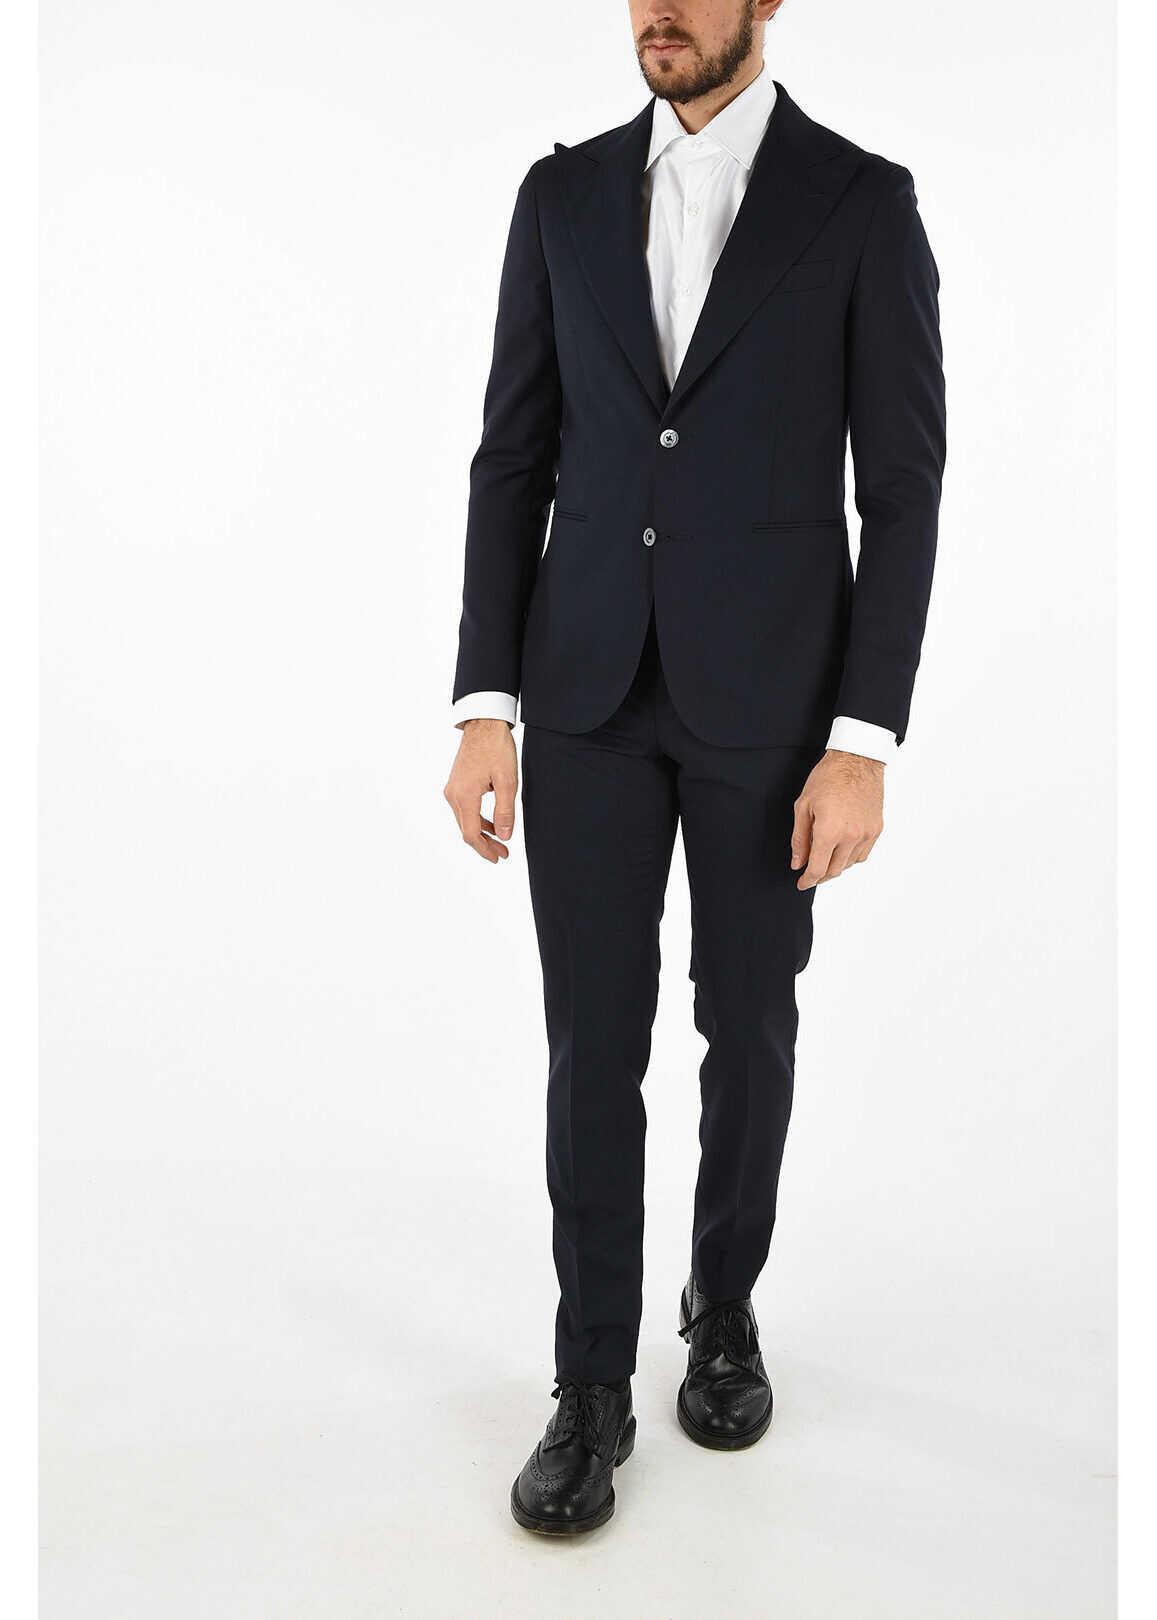 CC COLLECTION peak lapel CEREMONY REWARD 3 piece waistcoat s thumbnail